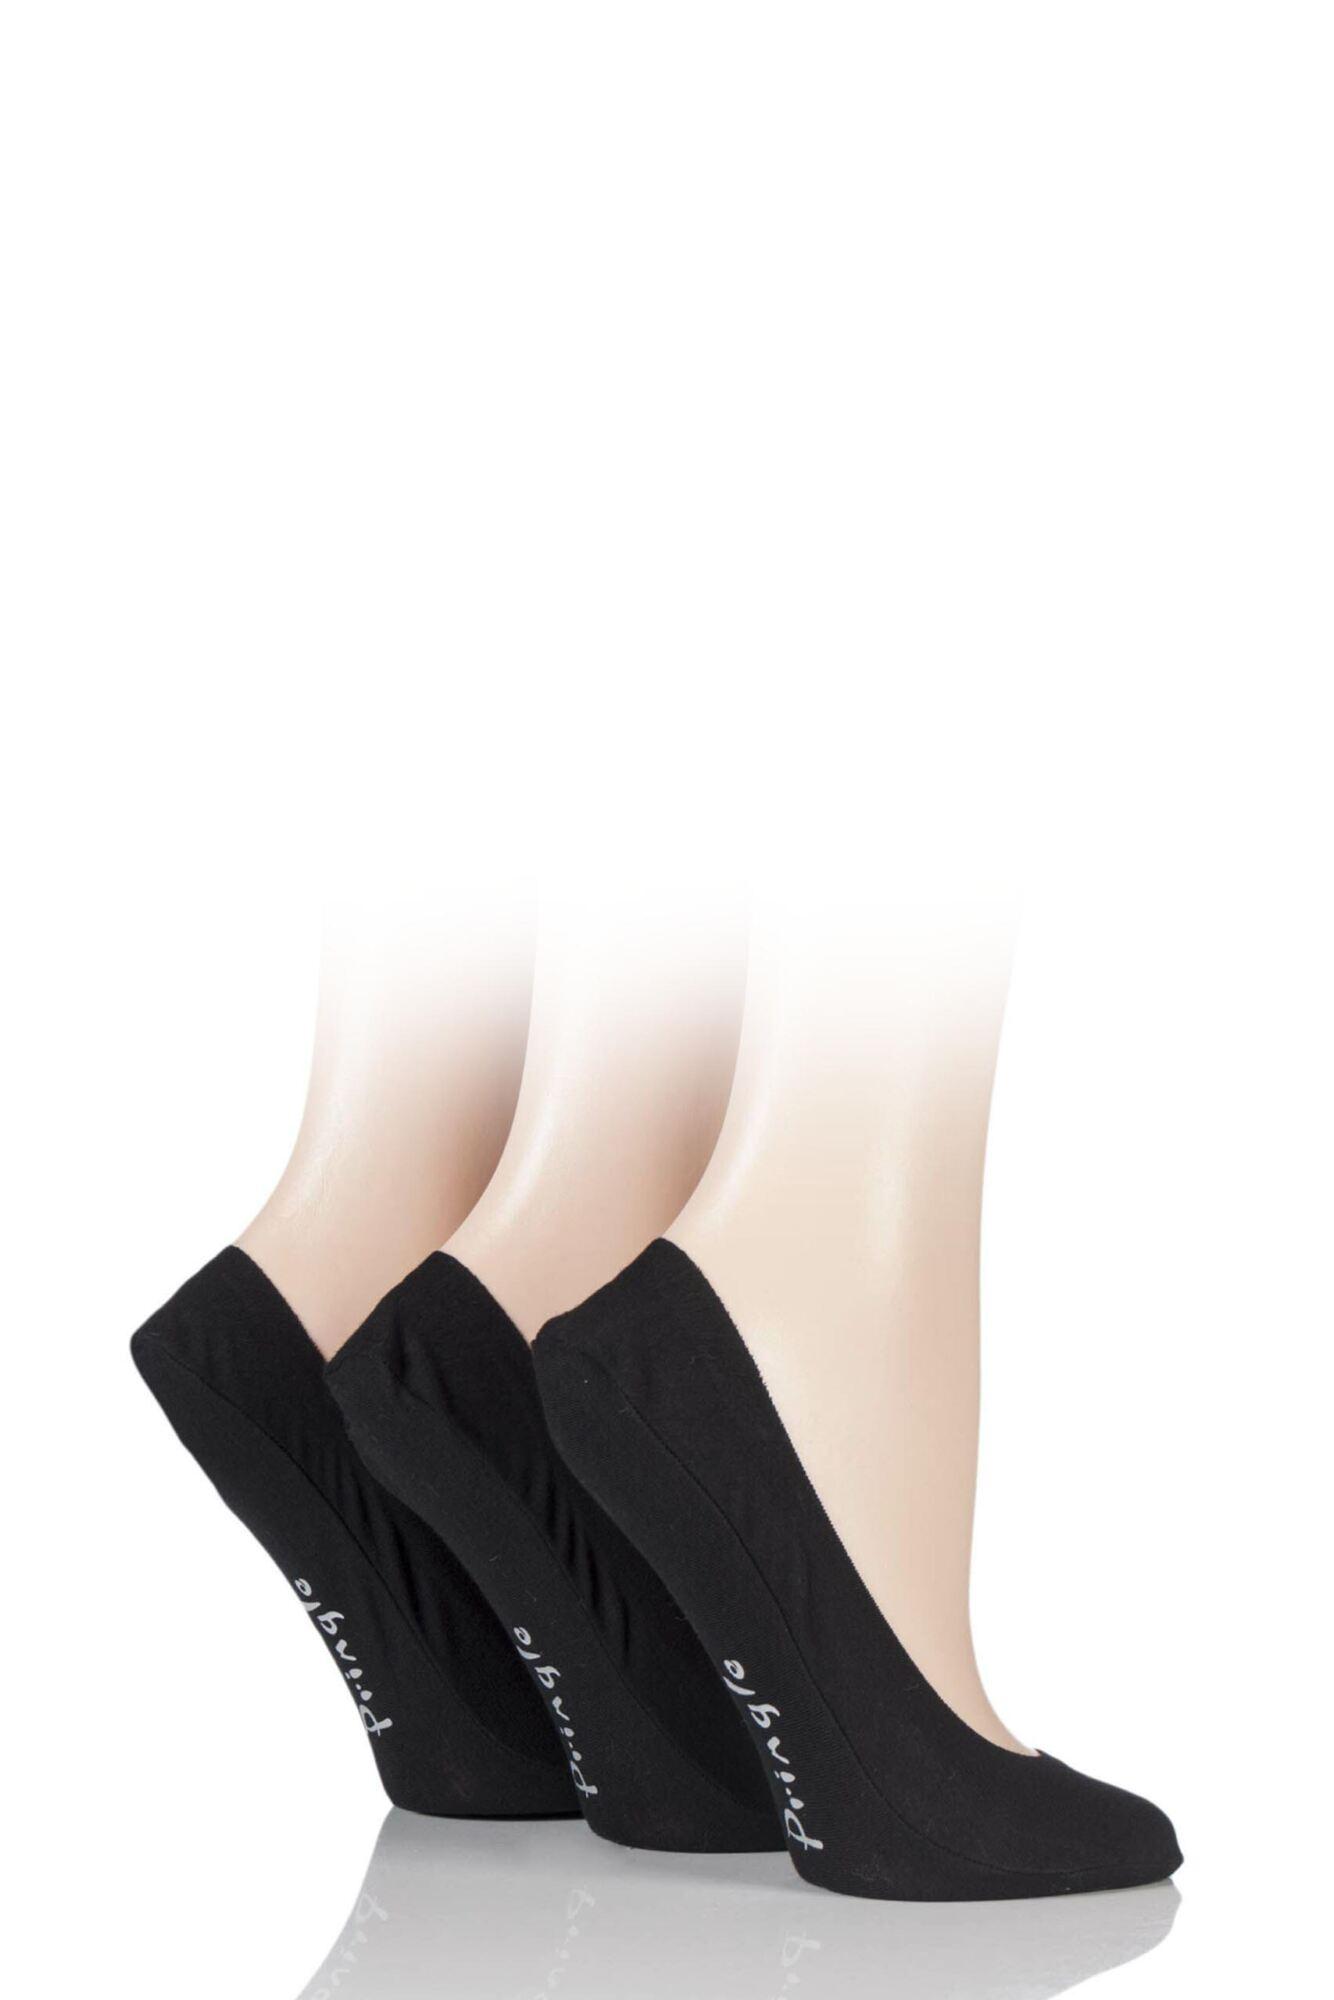 3 Pair Marian Shoe Liners Ladies - Pringle